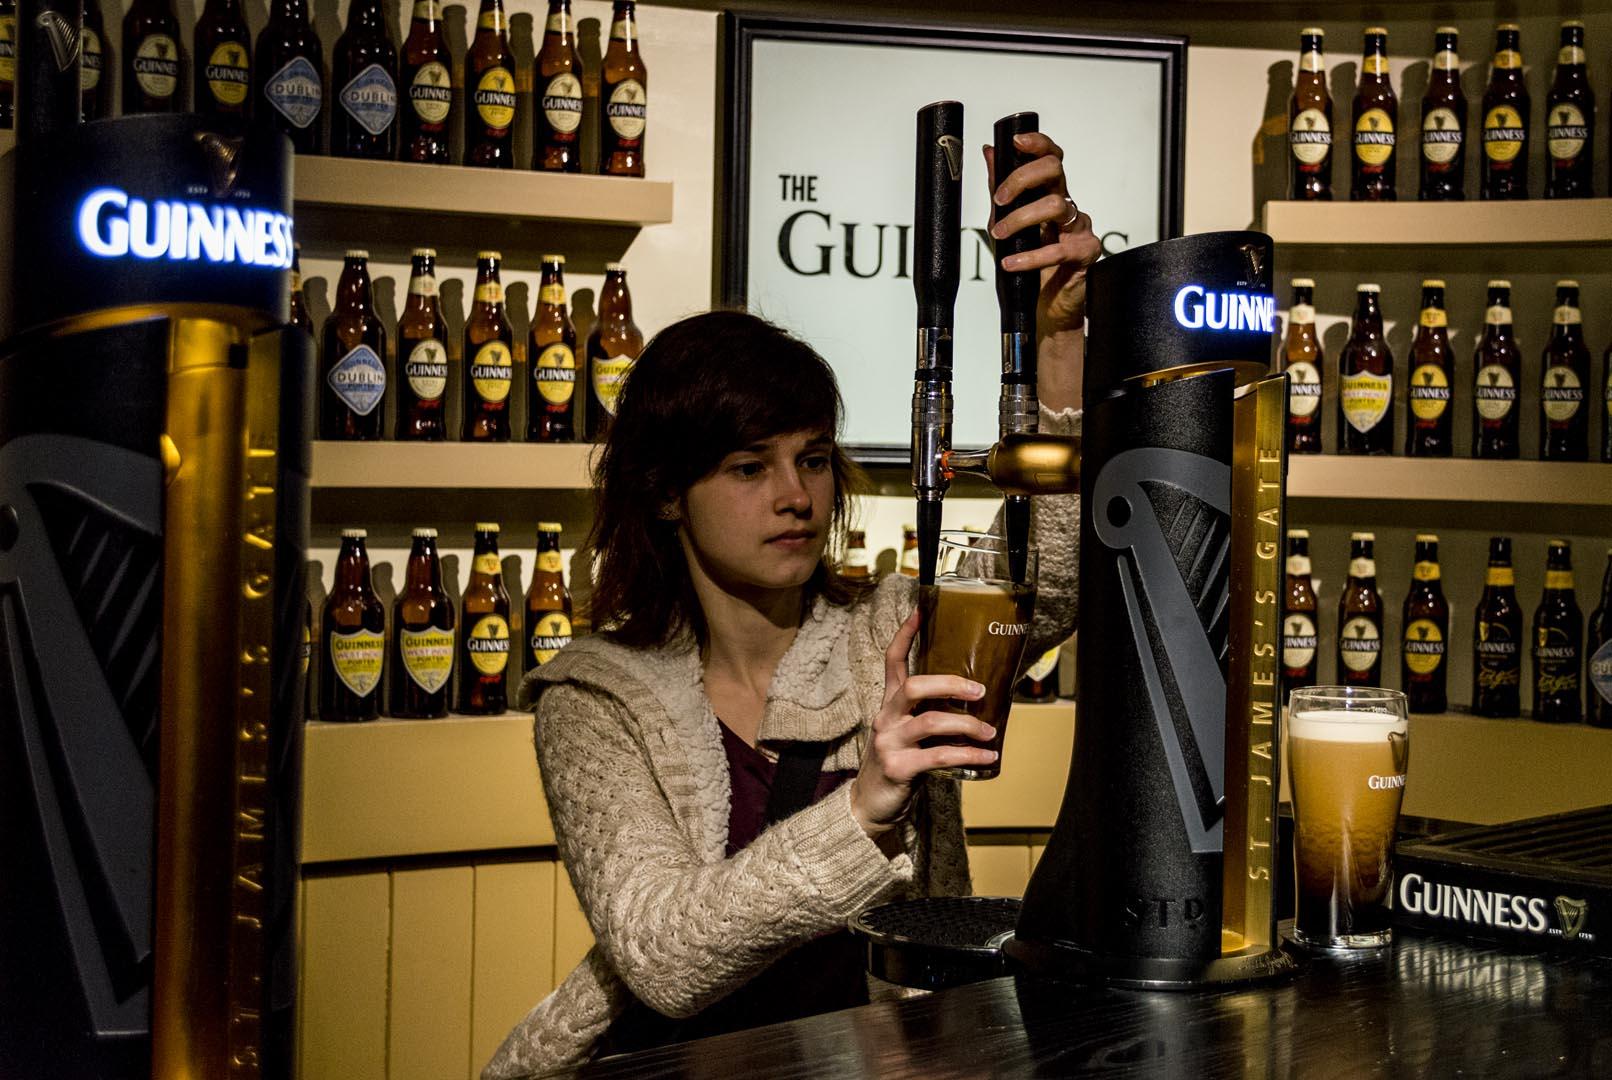 Dublin attractions - Guinness Storehouse